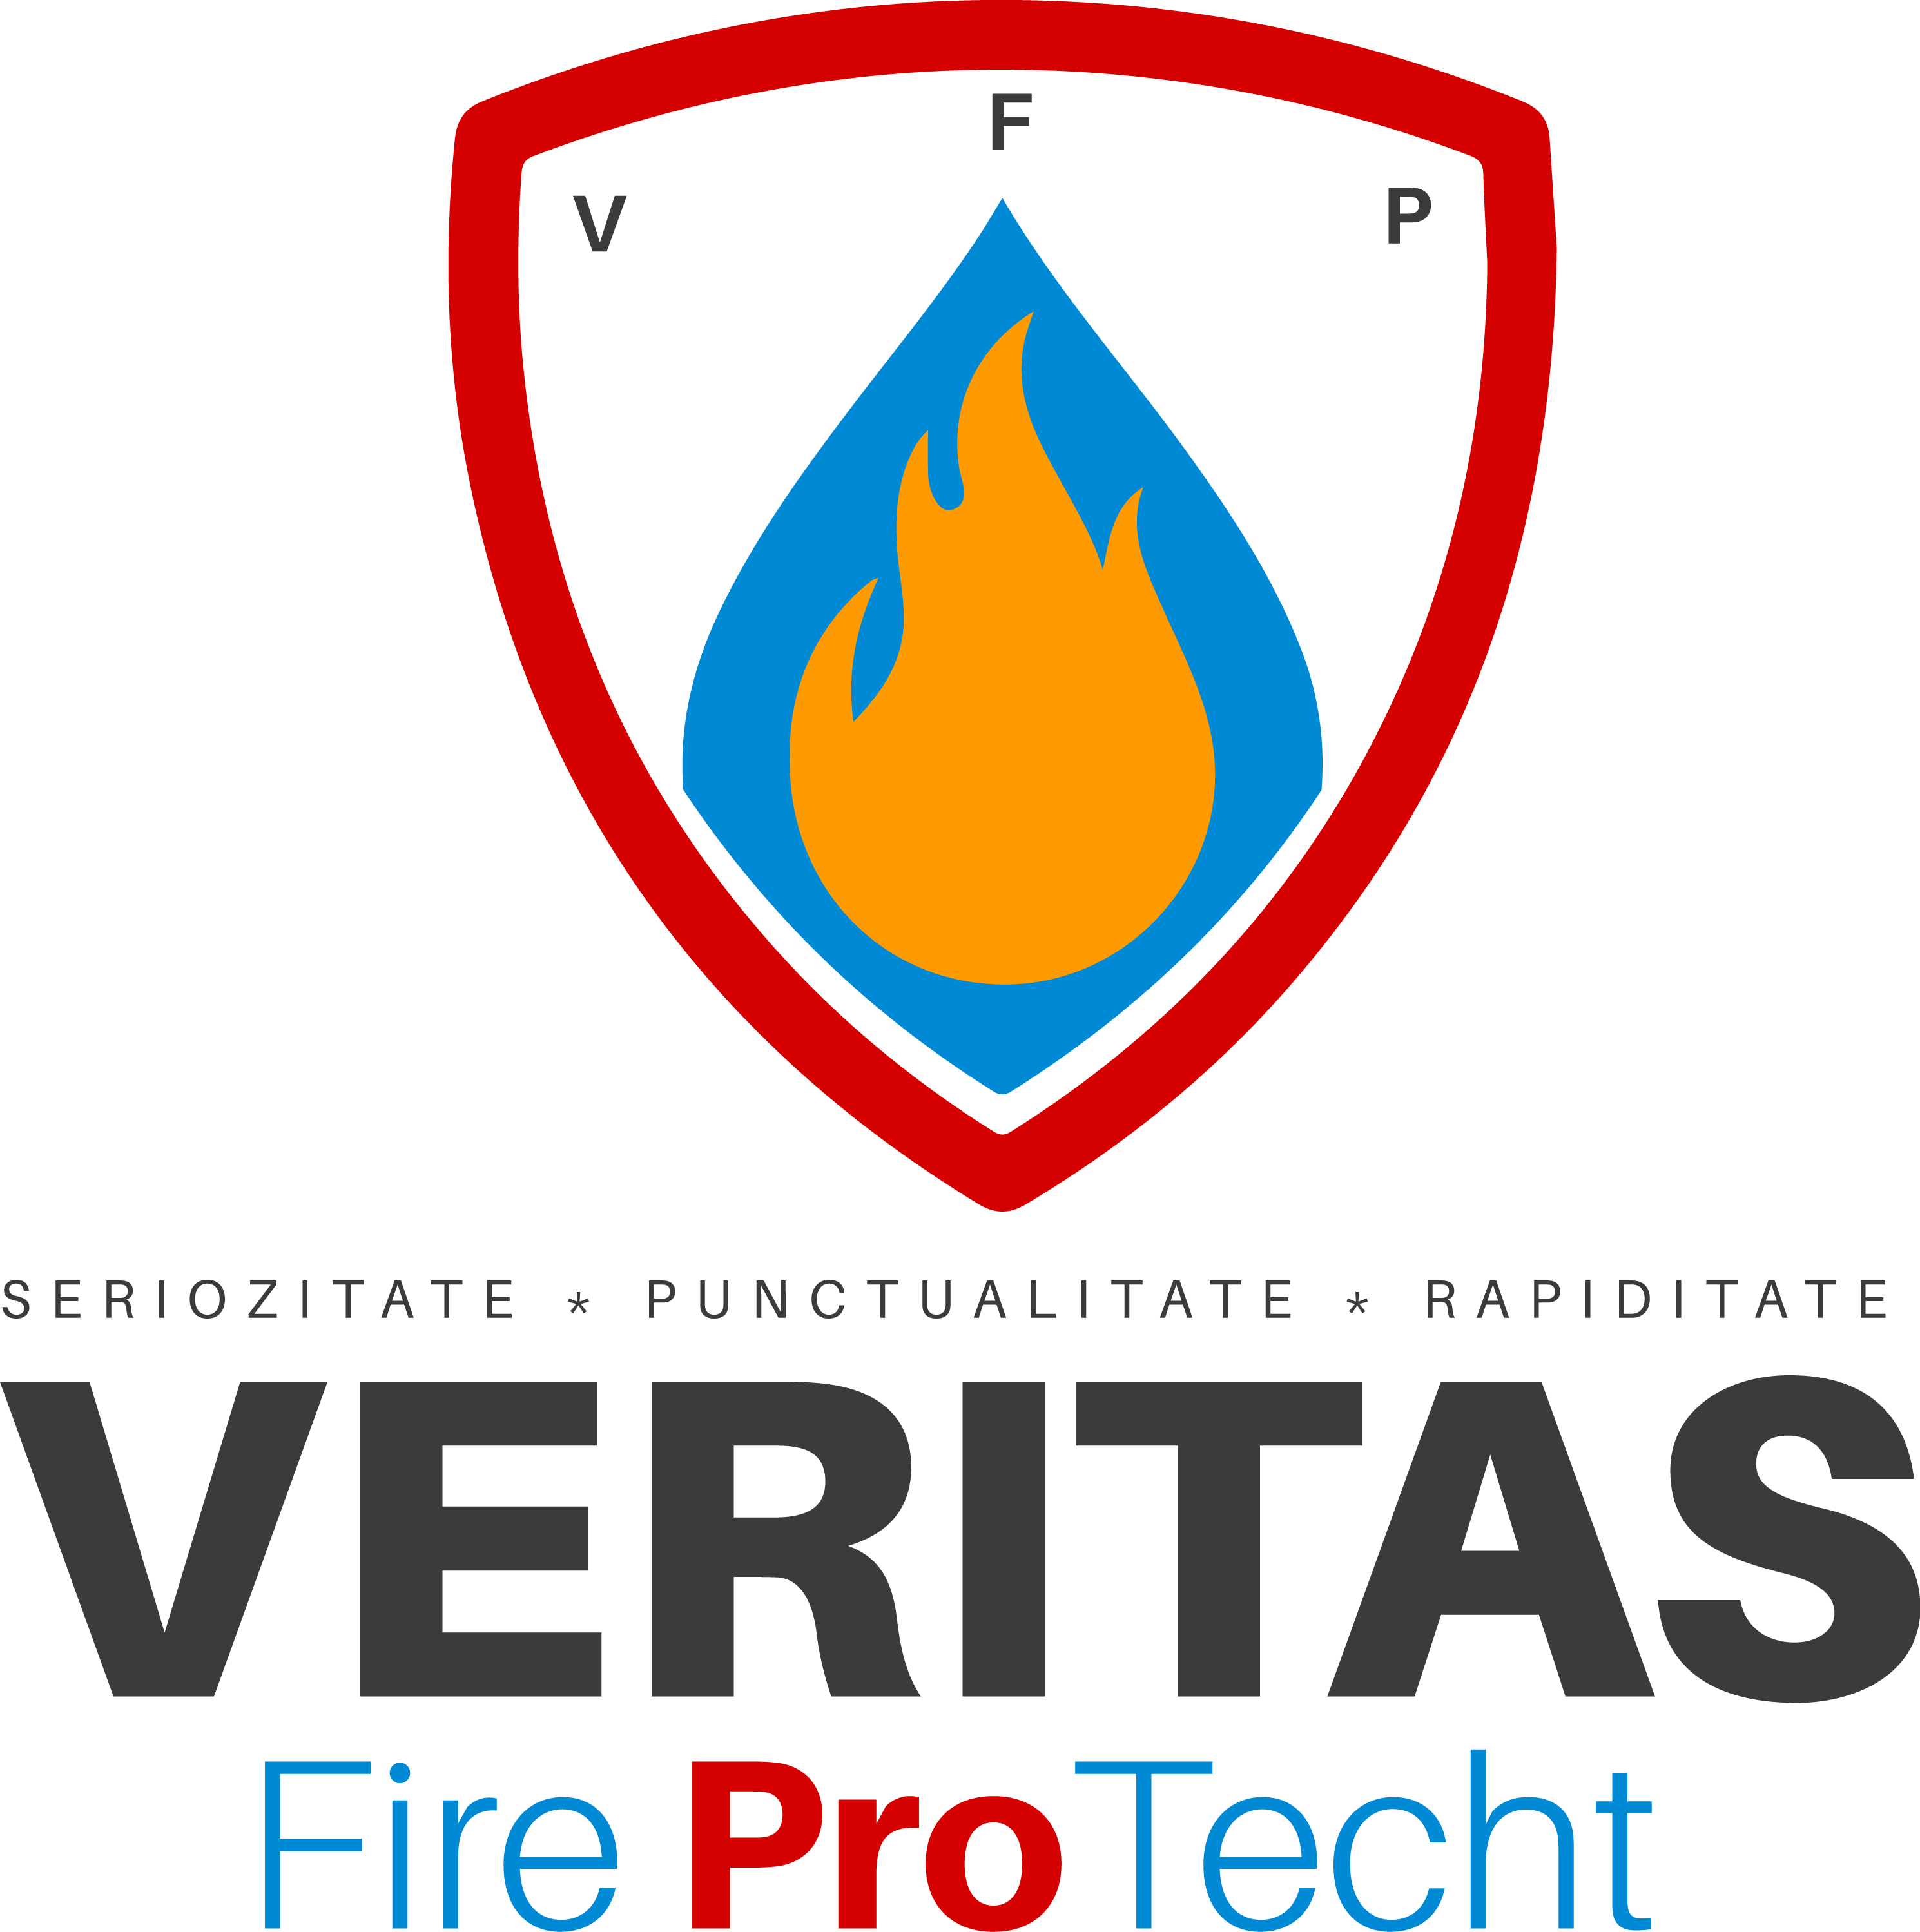 Veritas Fire ProTecht